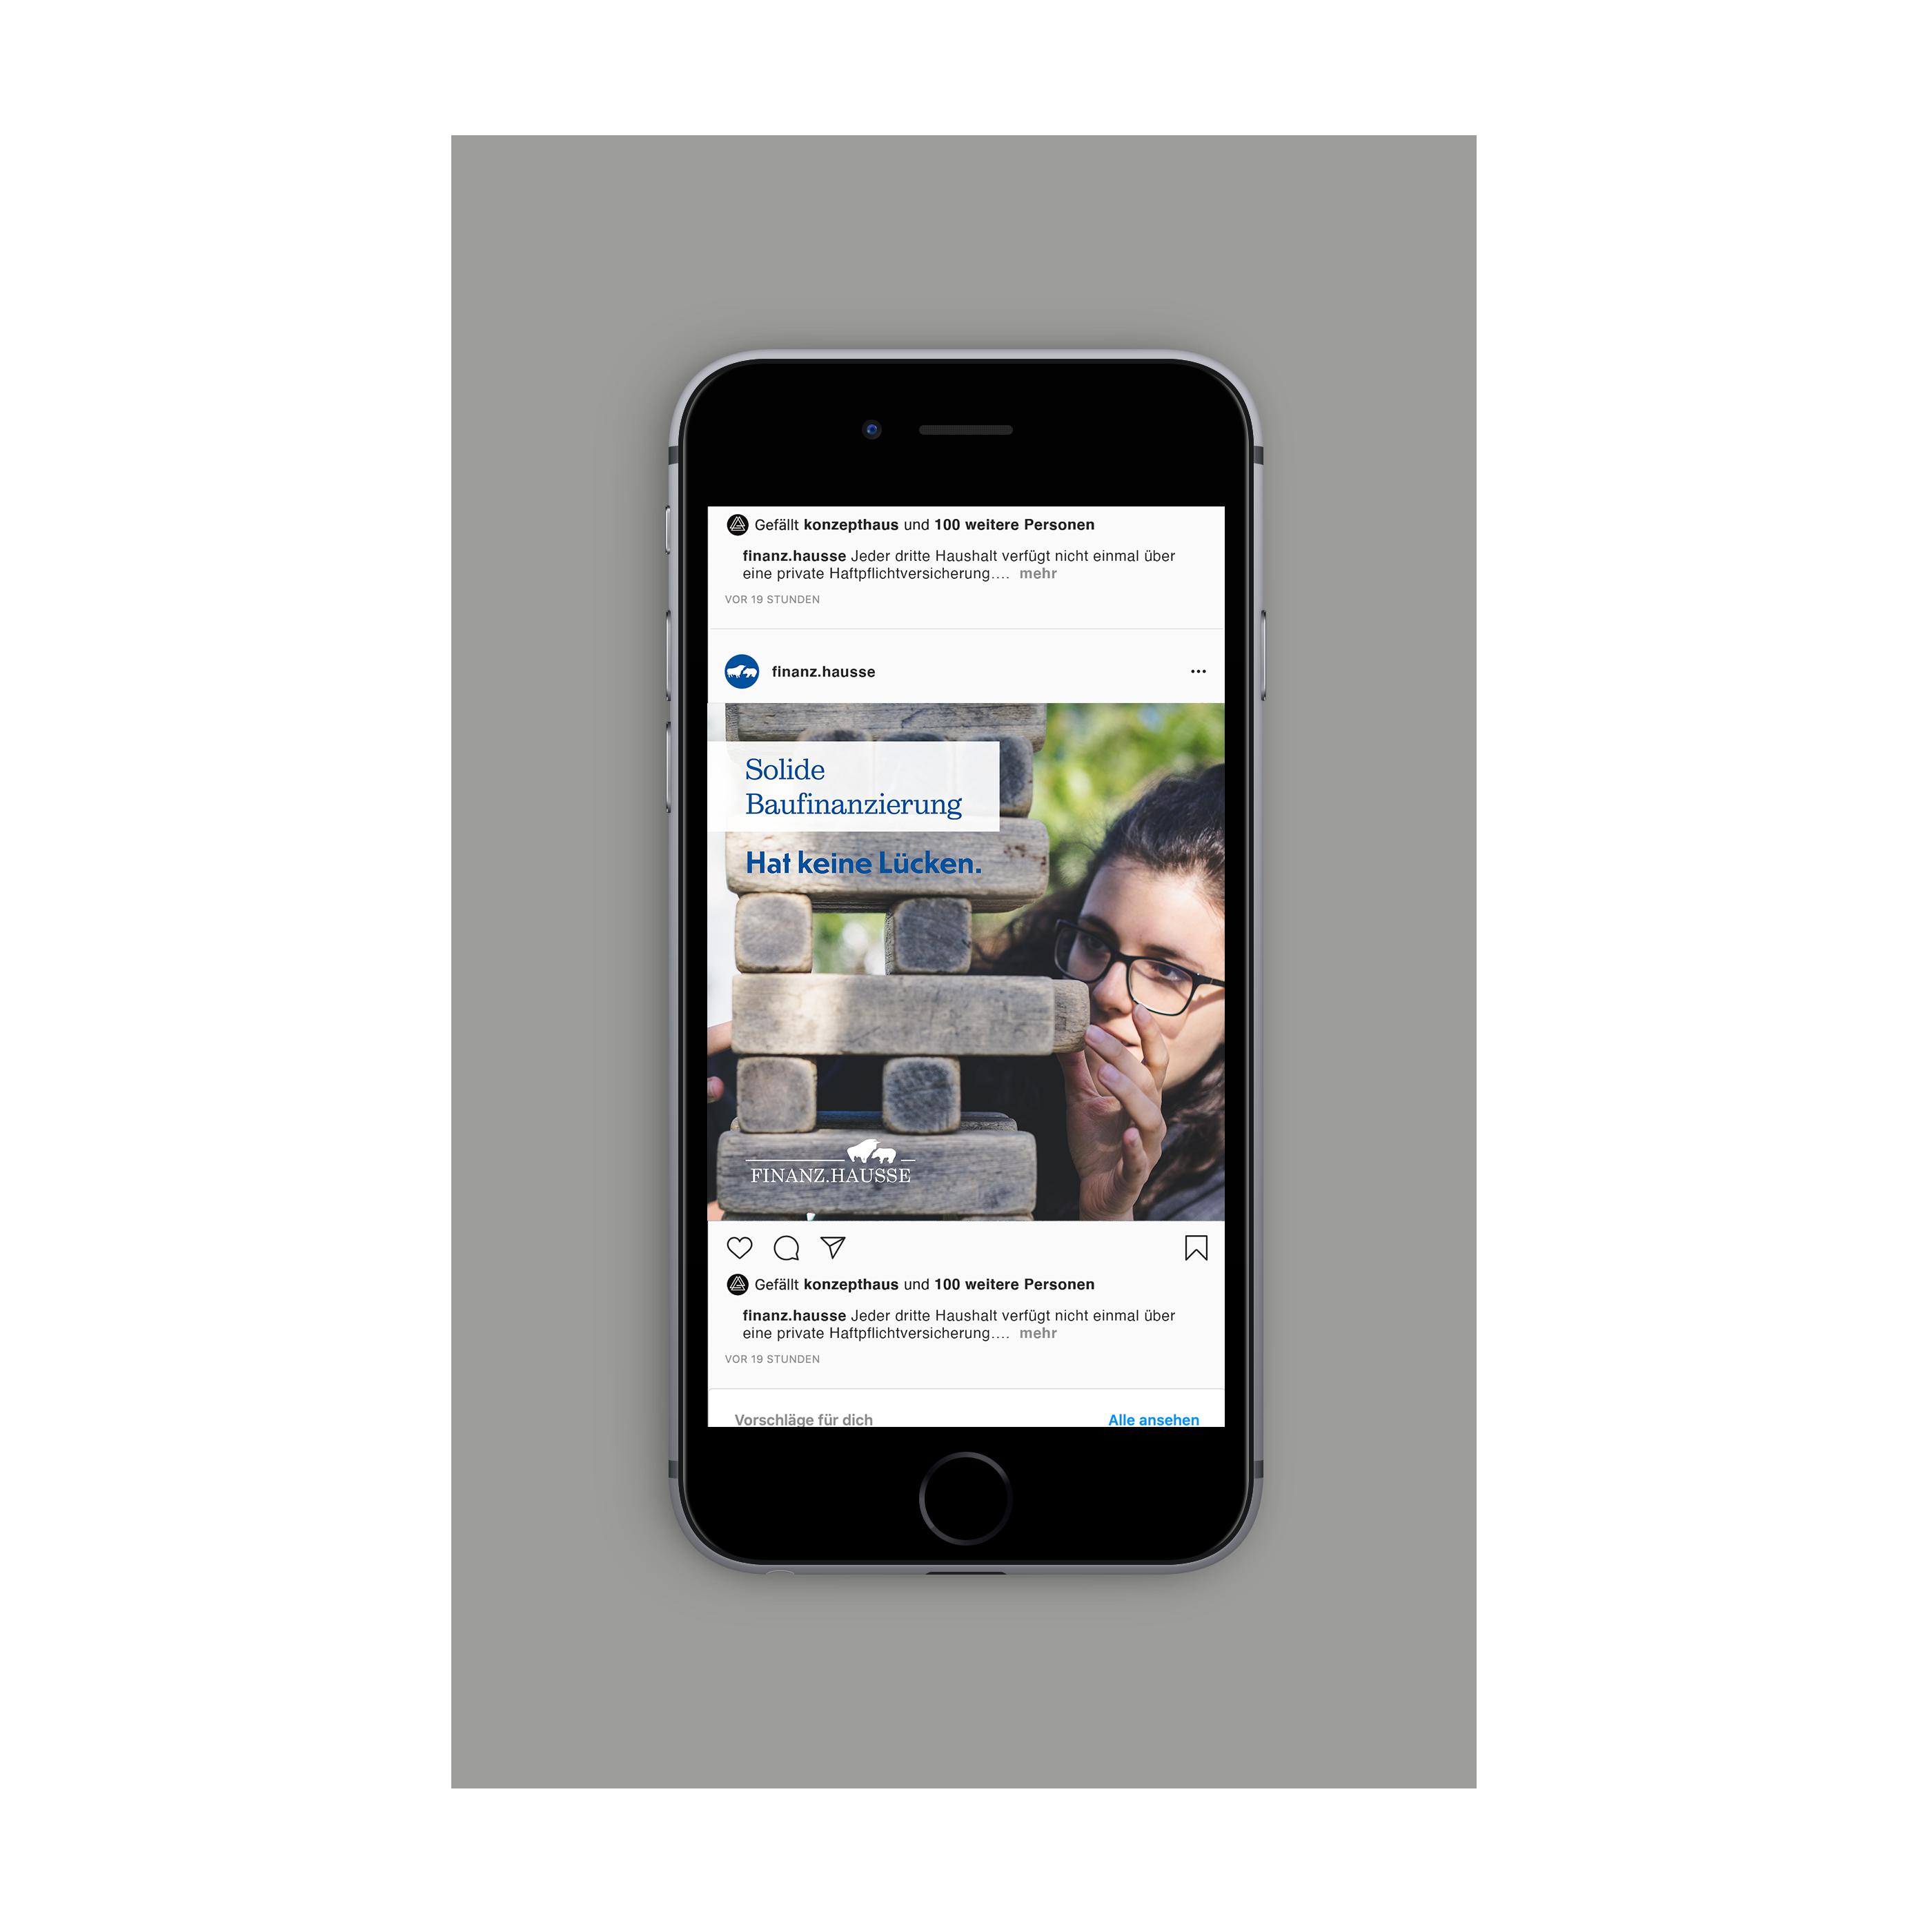 socialmedia-Finanzhausse1